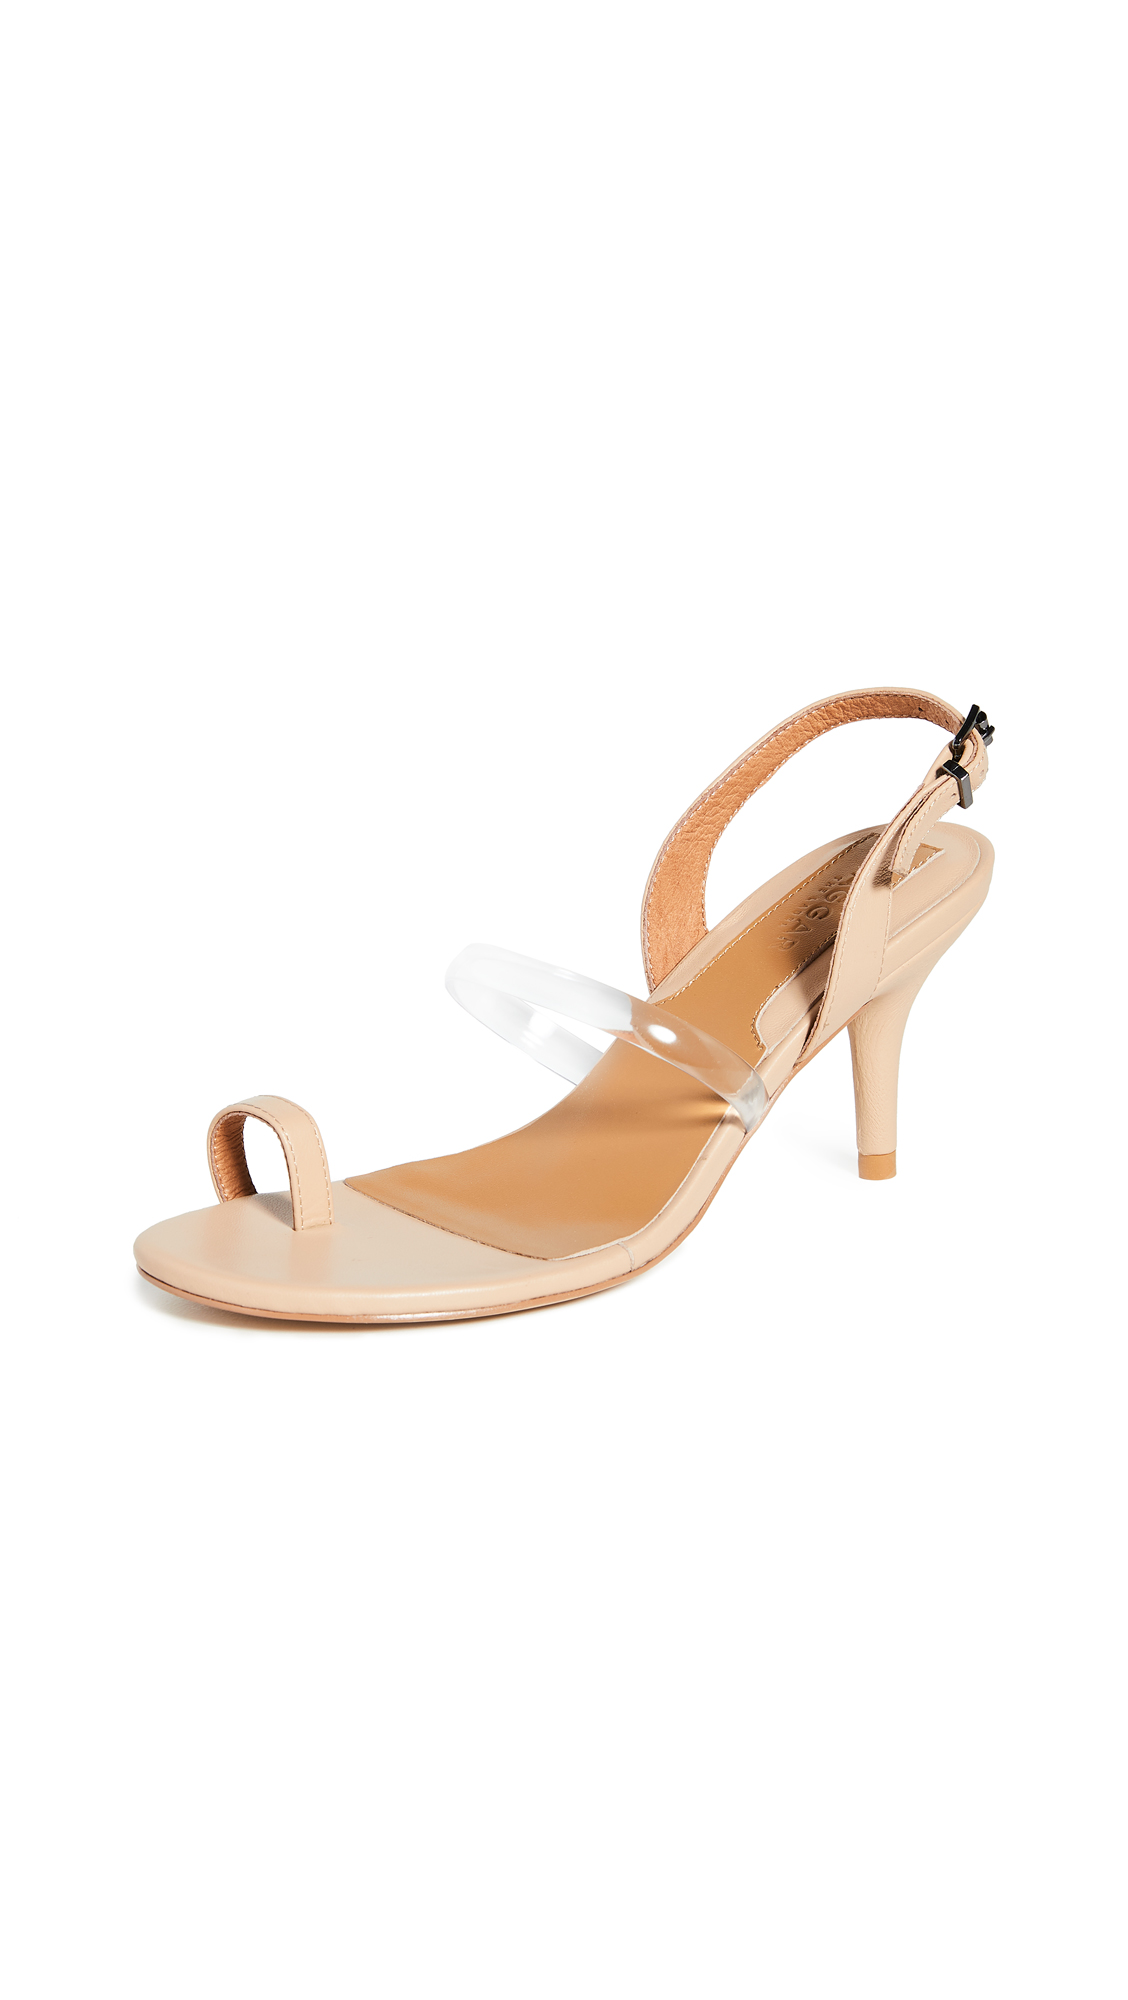 Buy JAGGAR PVC Sandals online, shop JAGGAR